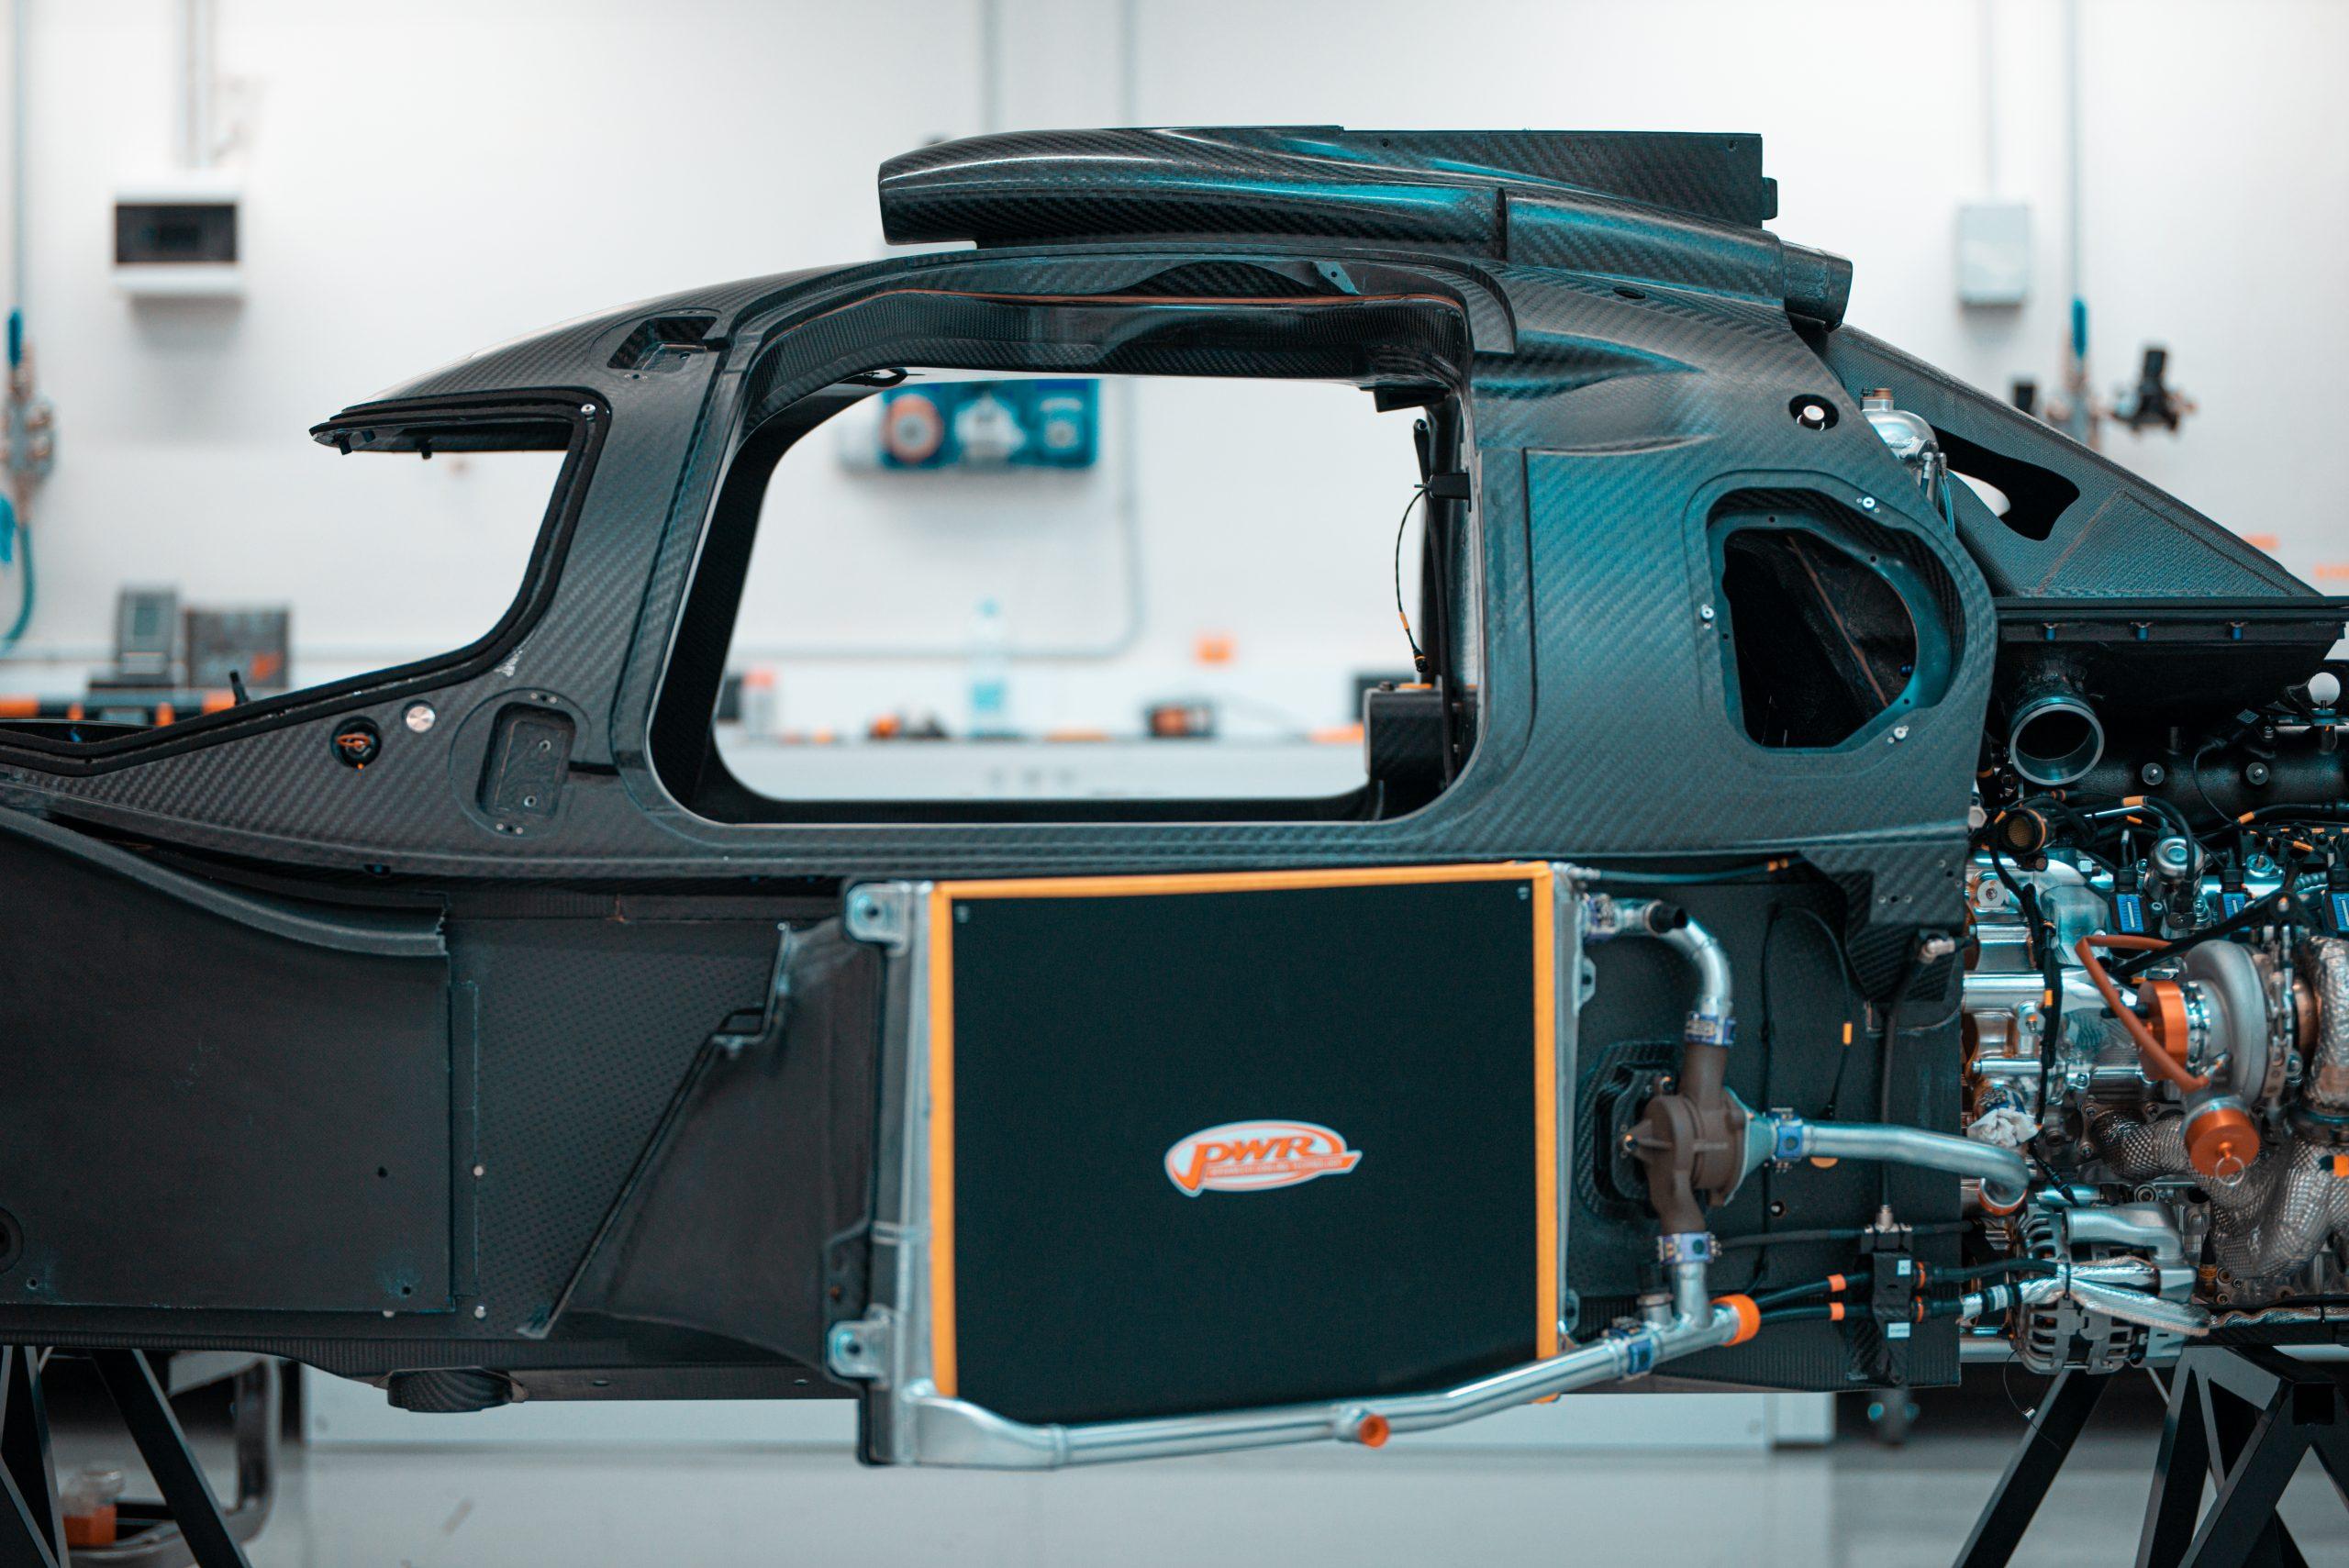 Glickenhaus 007 Hypercar LMH monocoque